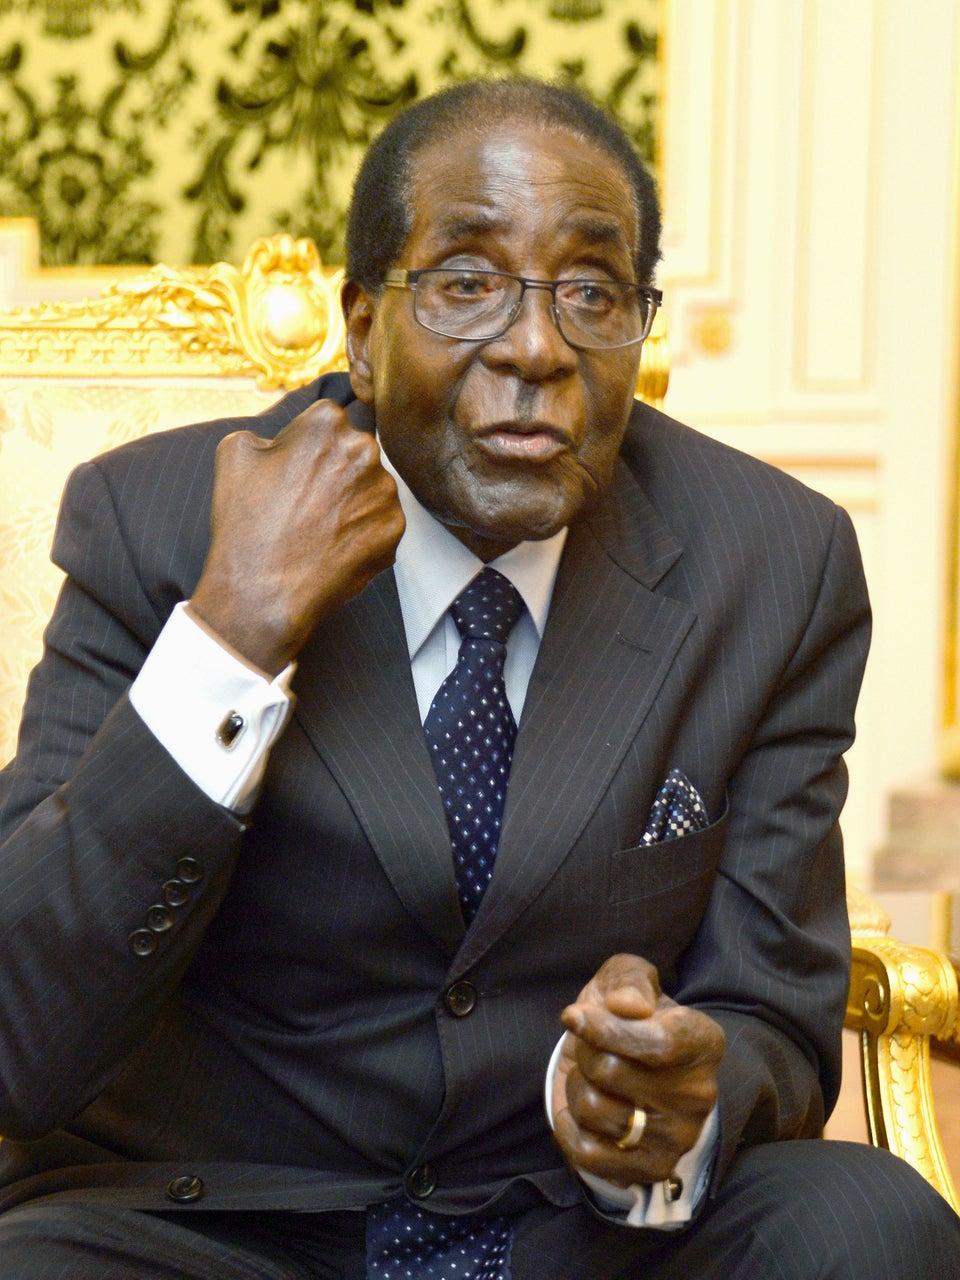 Zimbabwe's President Robert Mugabe Under House Arrest After Apparent Military Coup